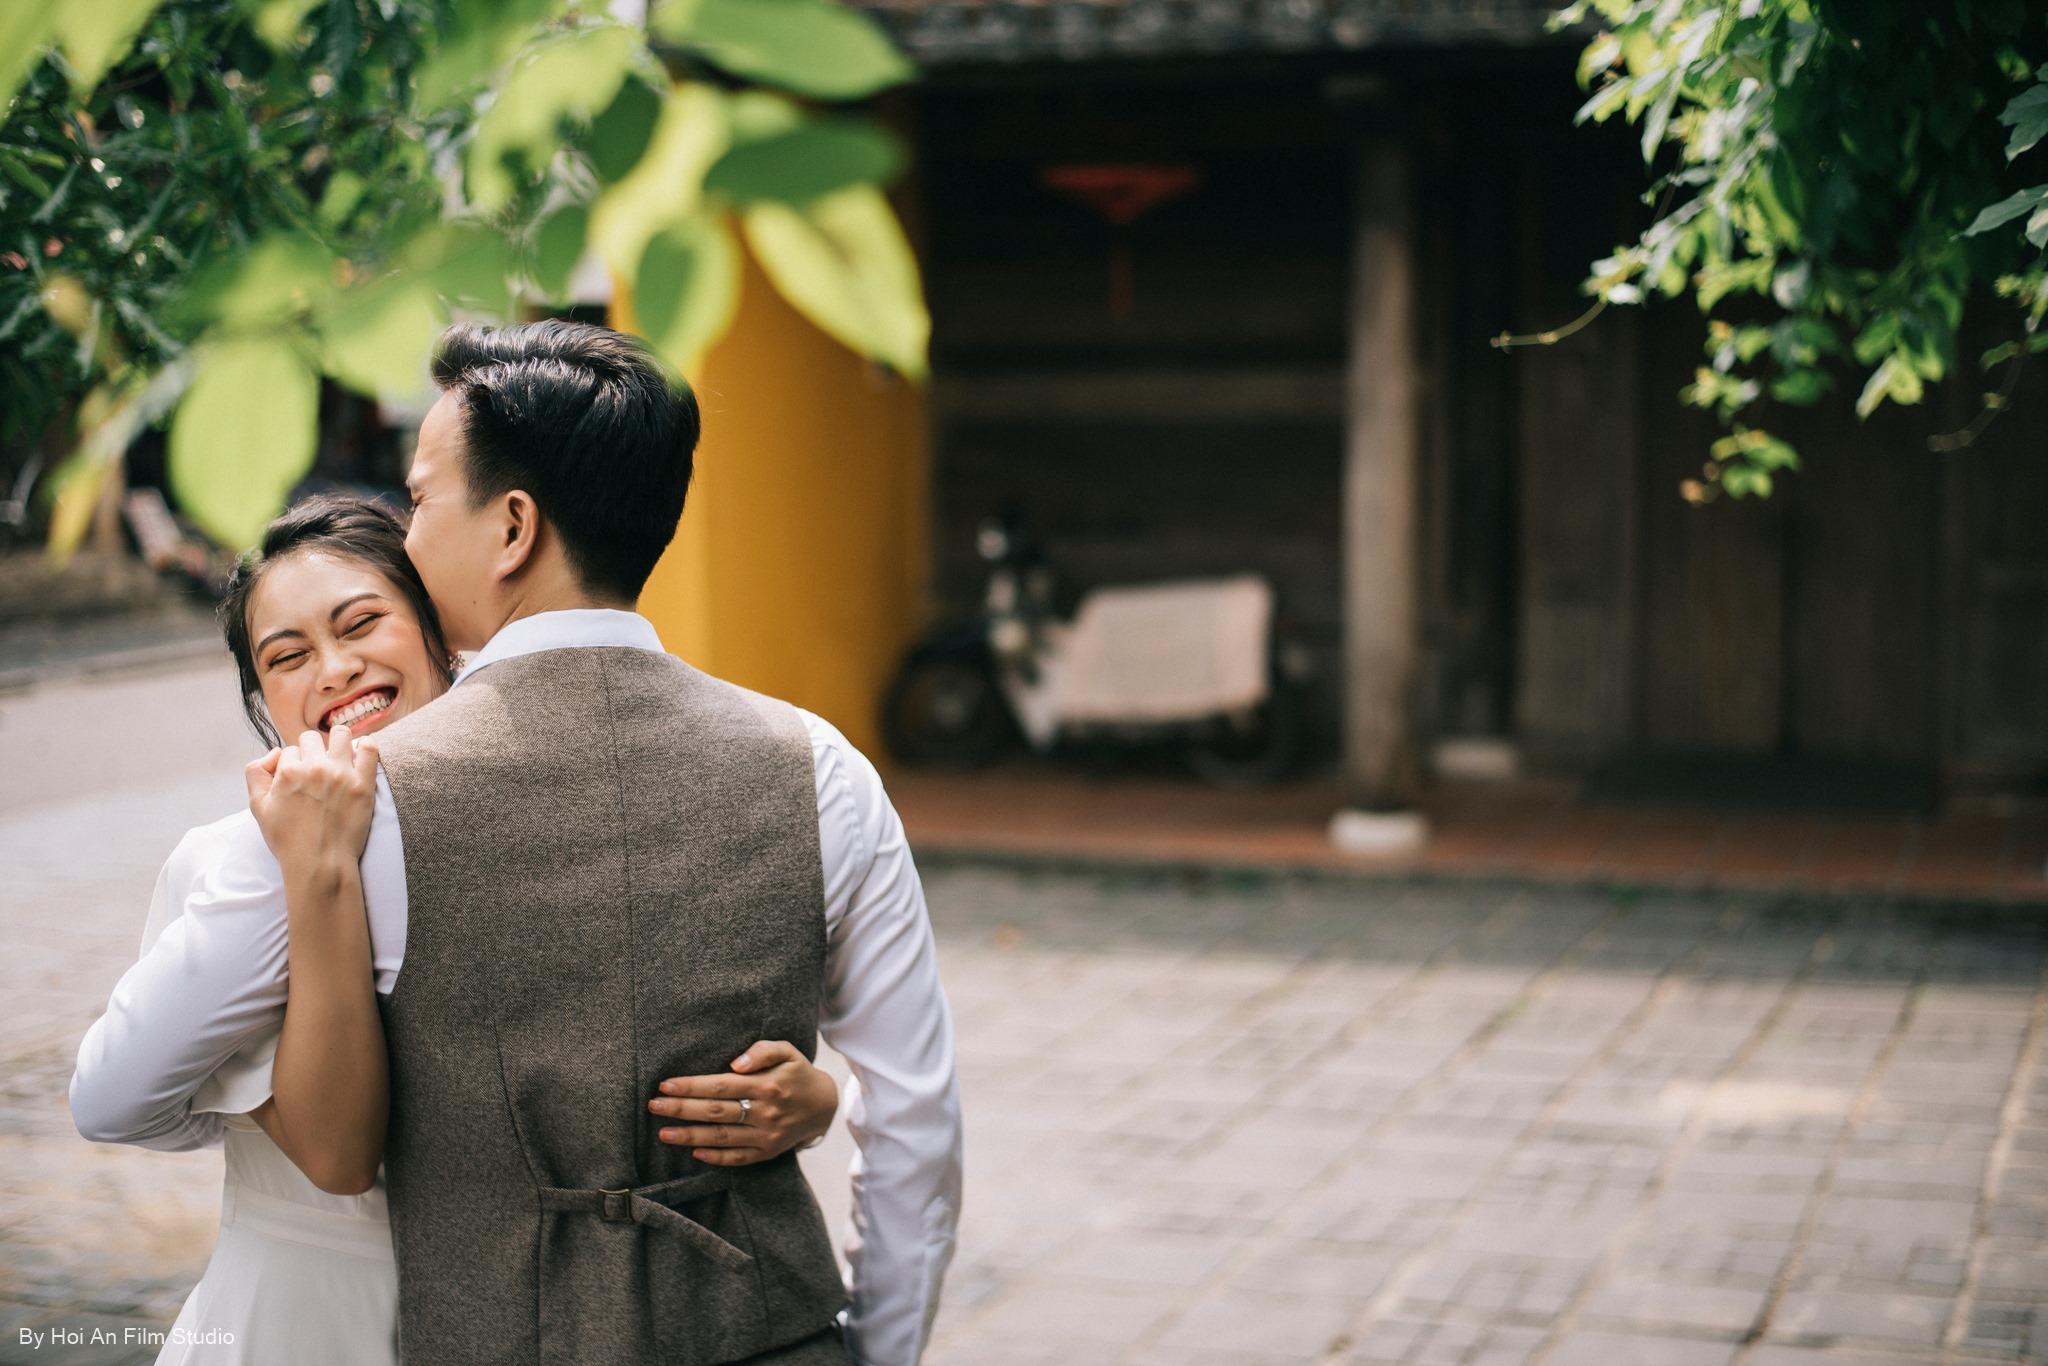 hoi an wedding photography